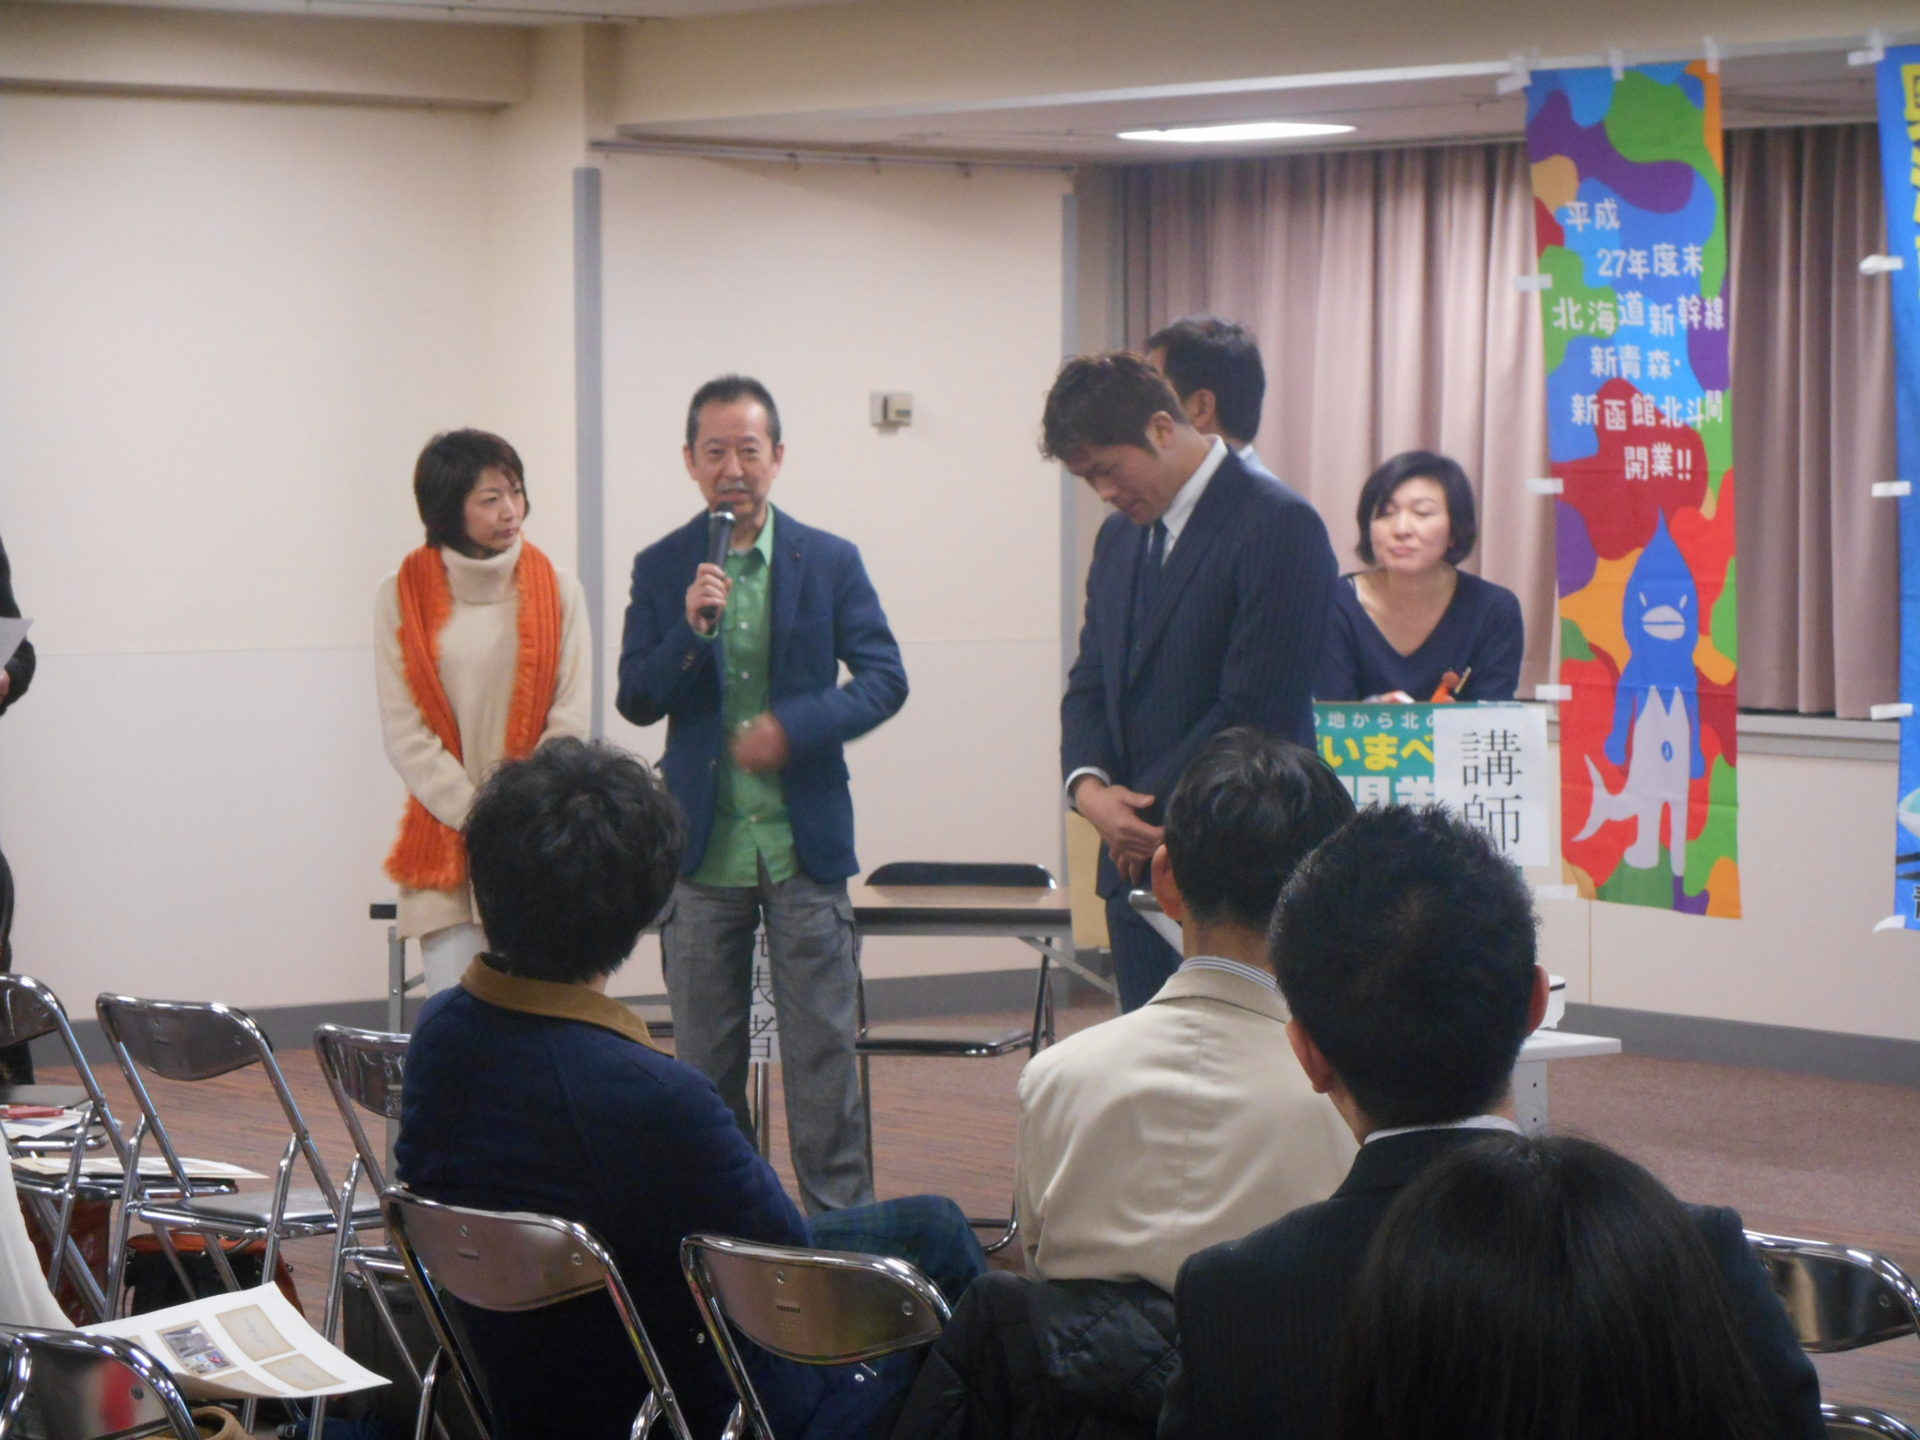 DSCN2748 1920x1440 - 第5回青森ゼミナールのアドバイザーで天間会長、西村副会長参加